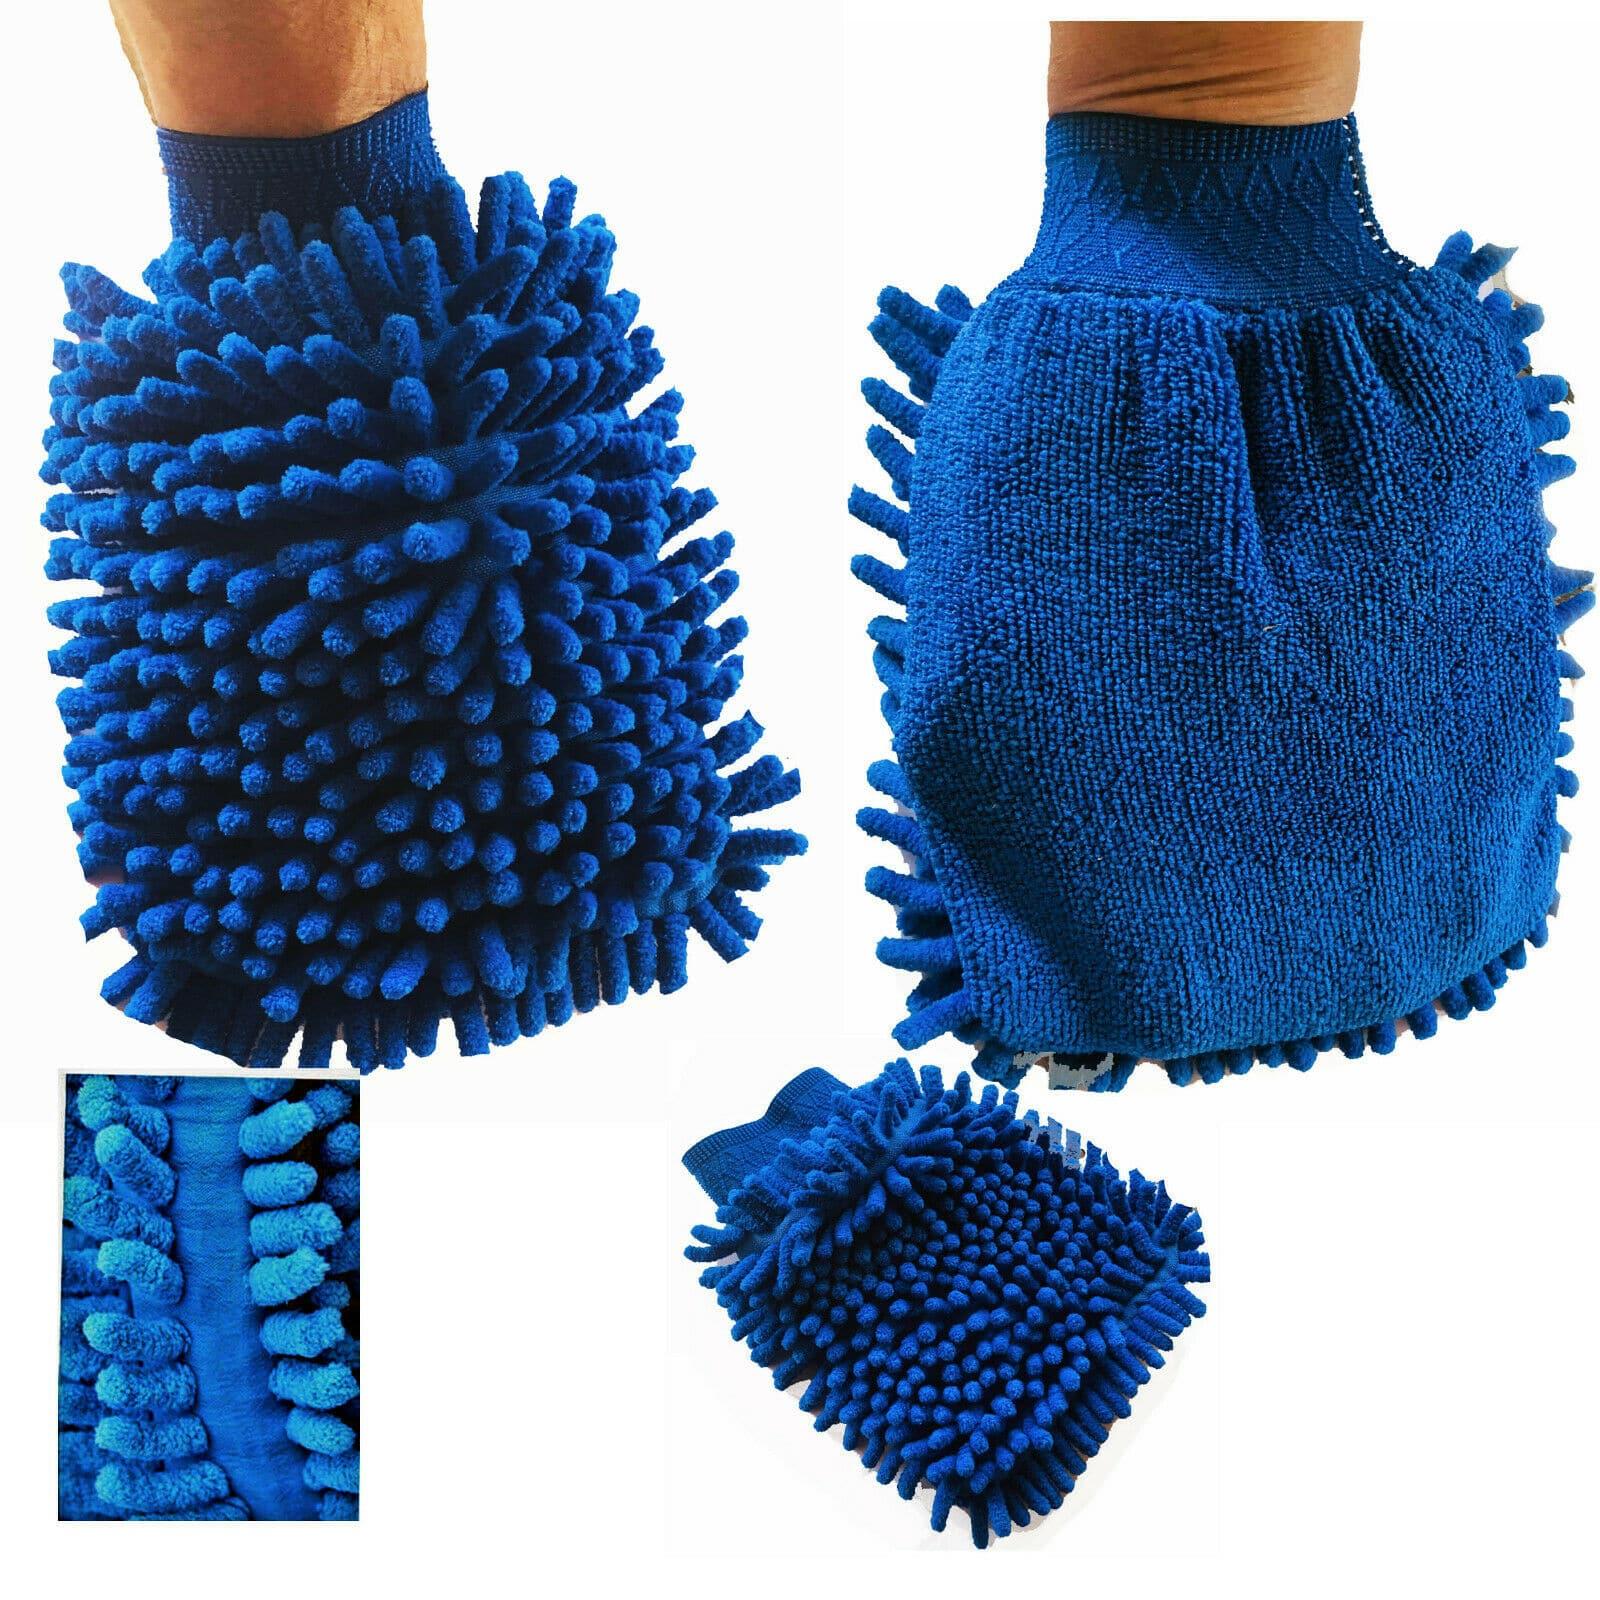 dusting gloves